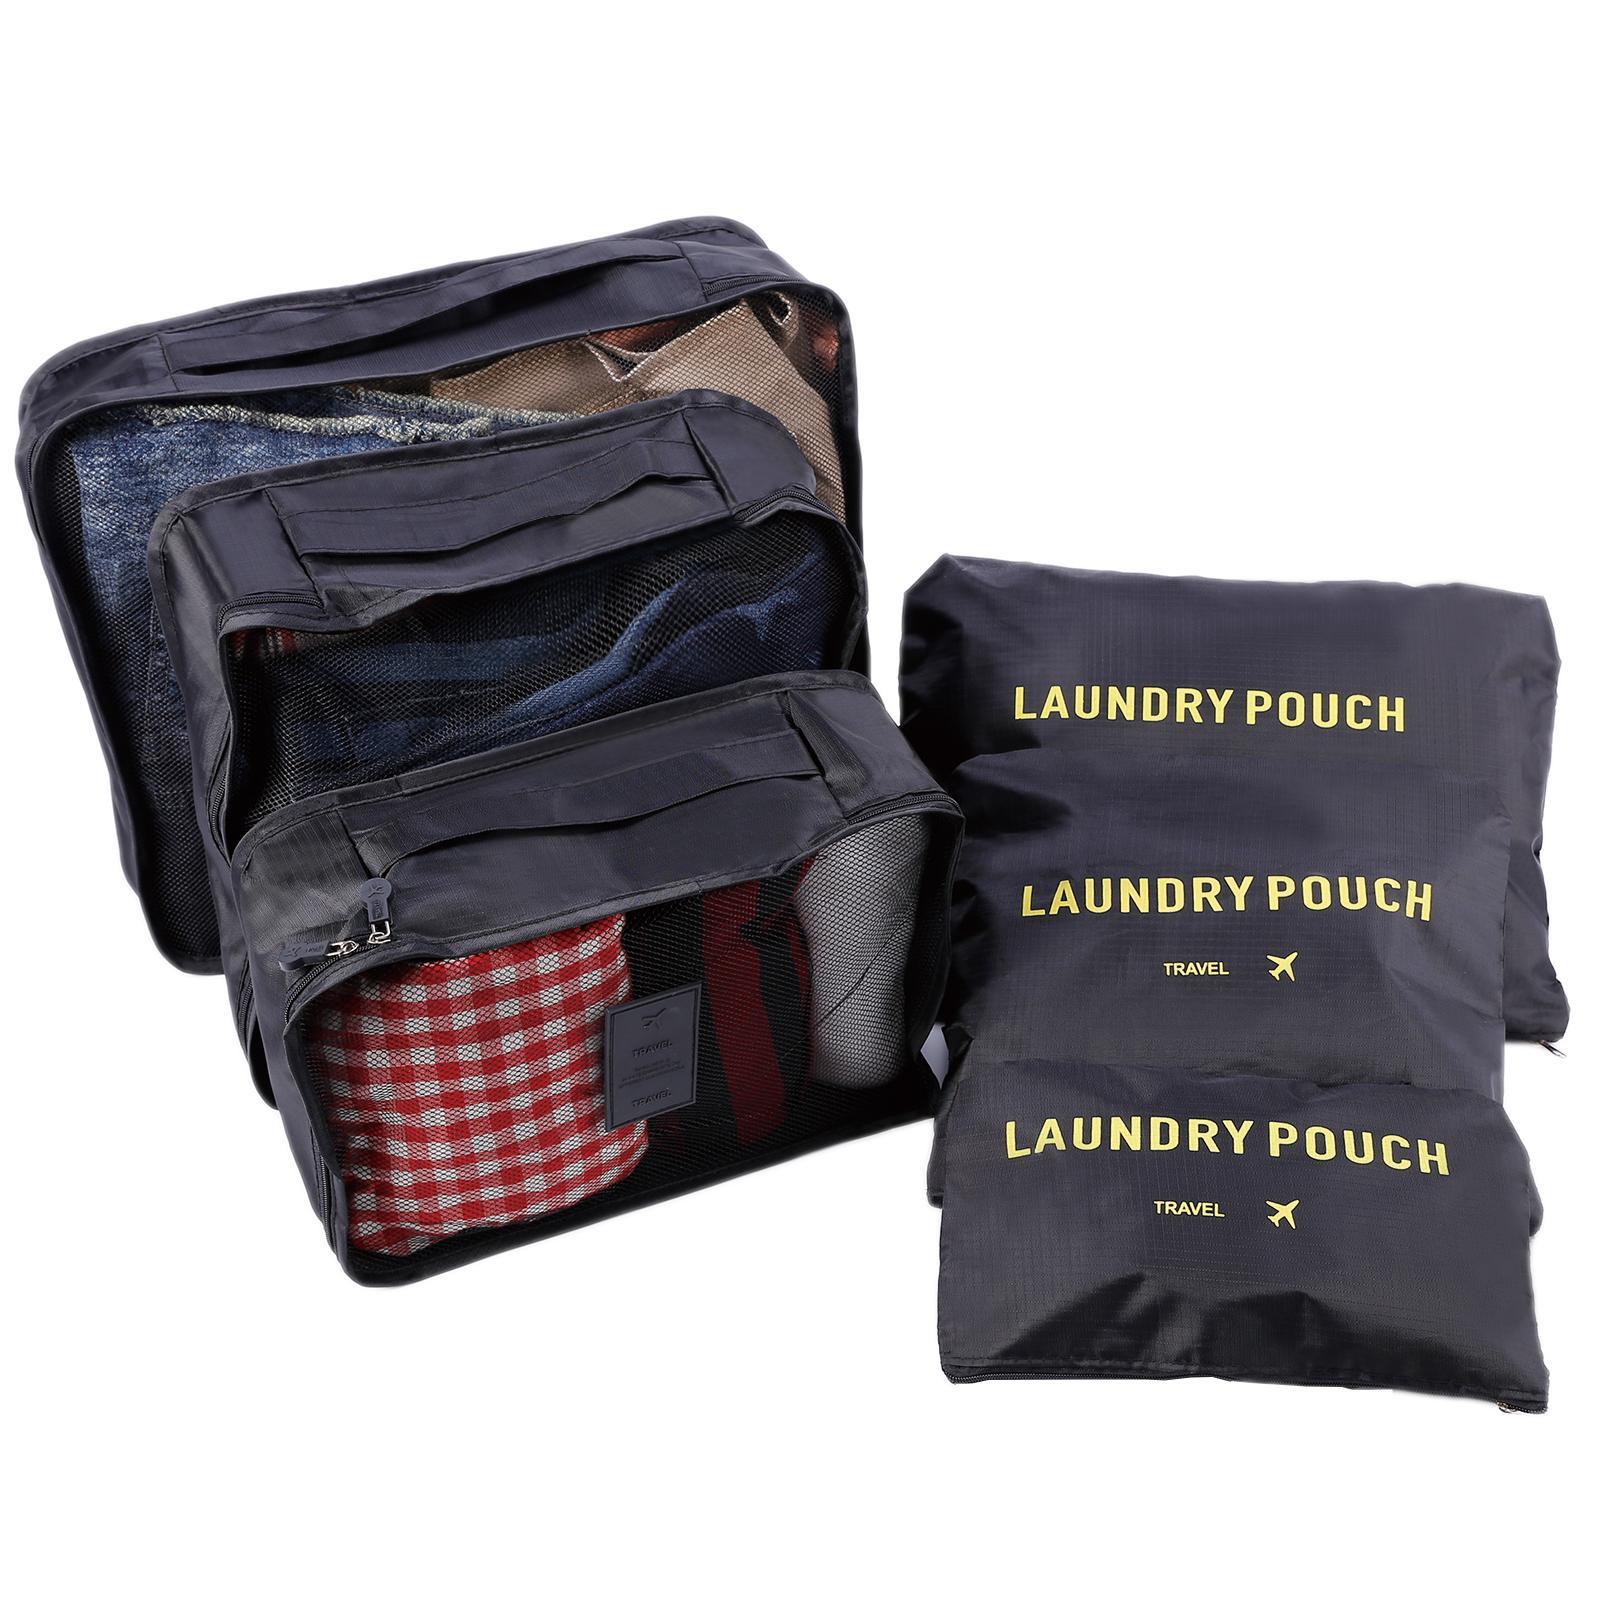 6542e2fe5505 Women's Packing Organizer - Buy Women's Packing Organizer at Best ...